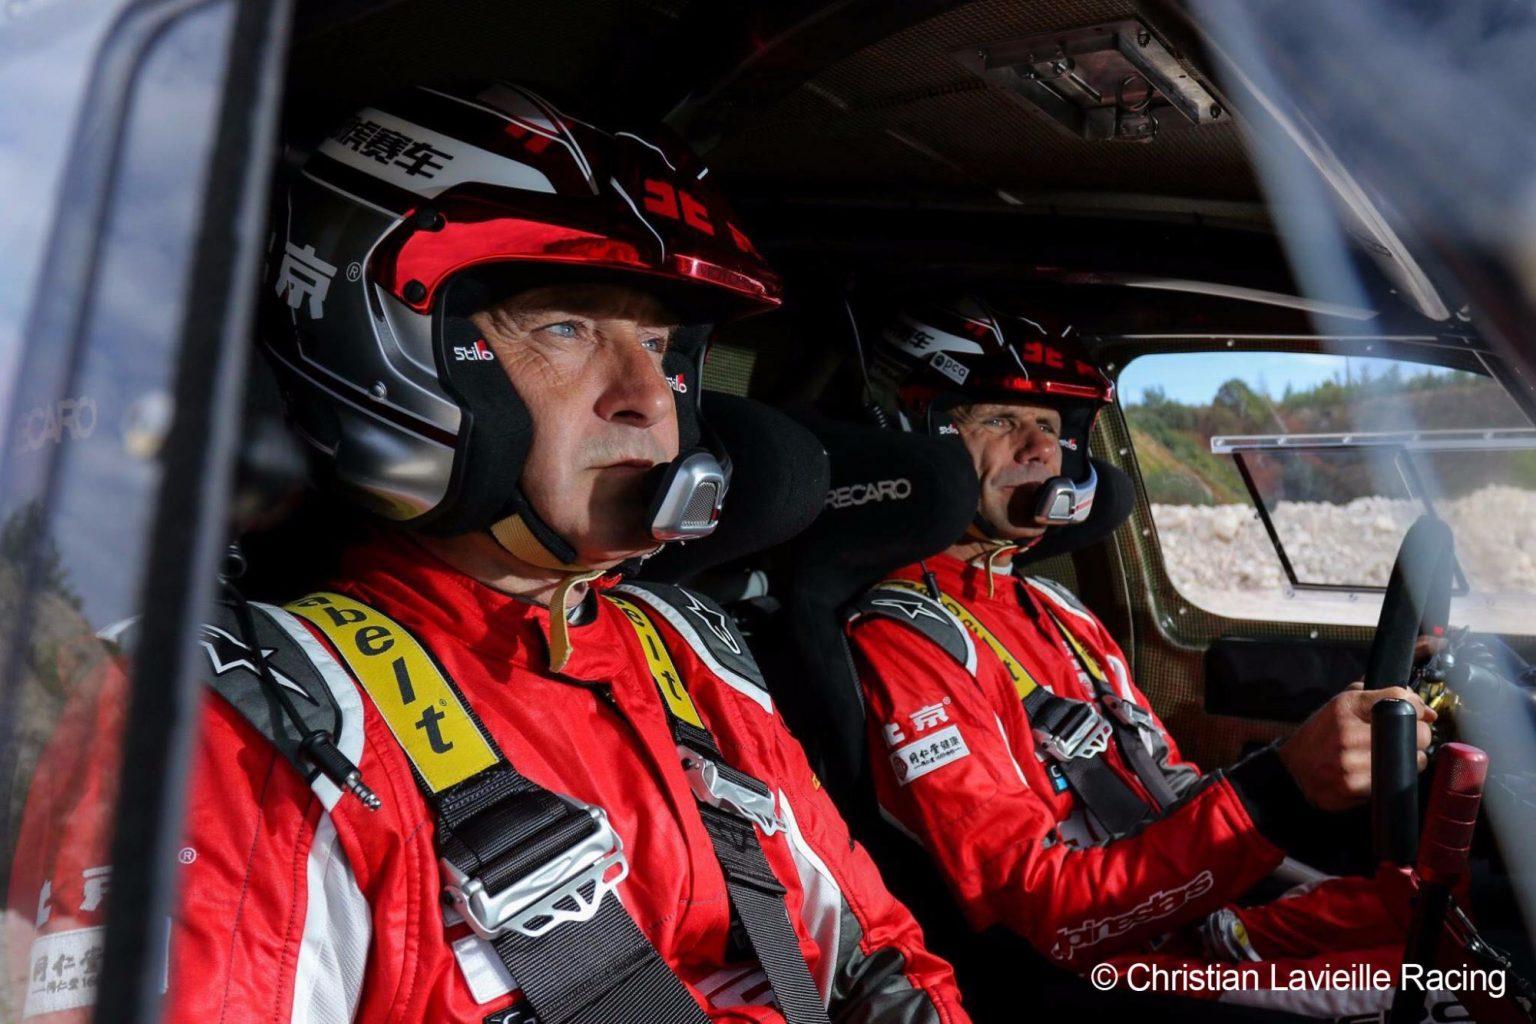 Christian Lavieille et Jean-Pierre Garcin : Victoire sur le Taklimakan Rally